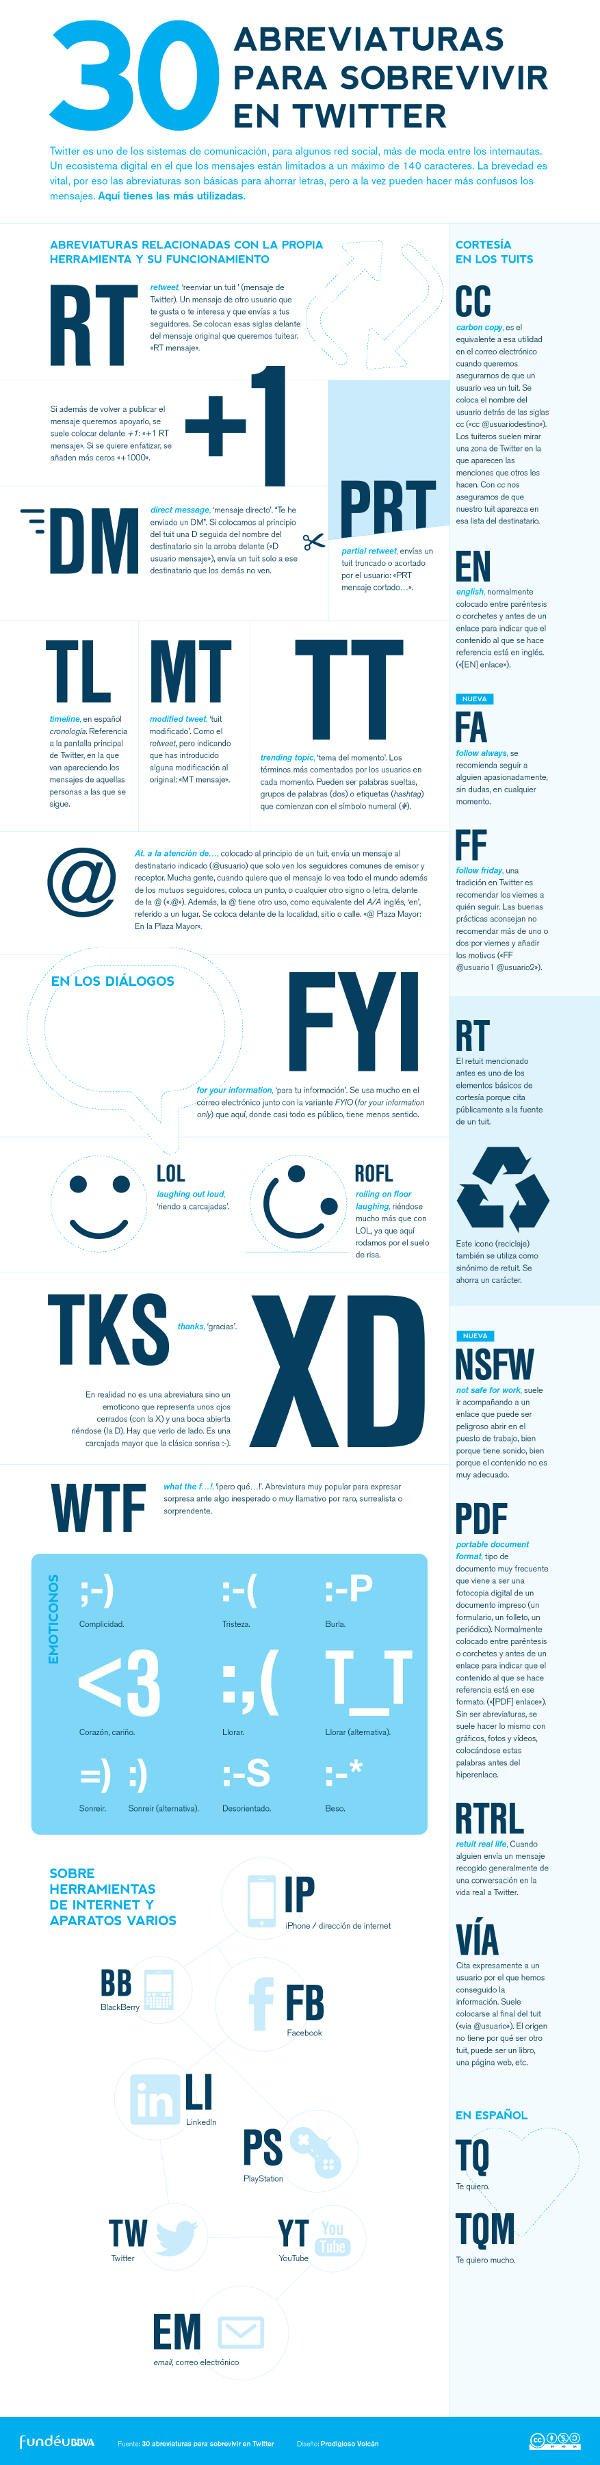 Infografía Twitter Terminología